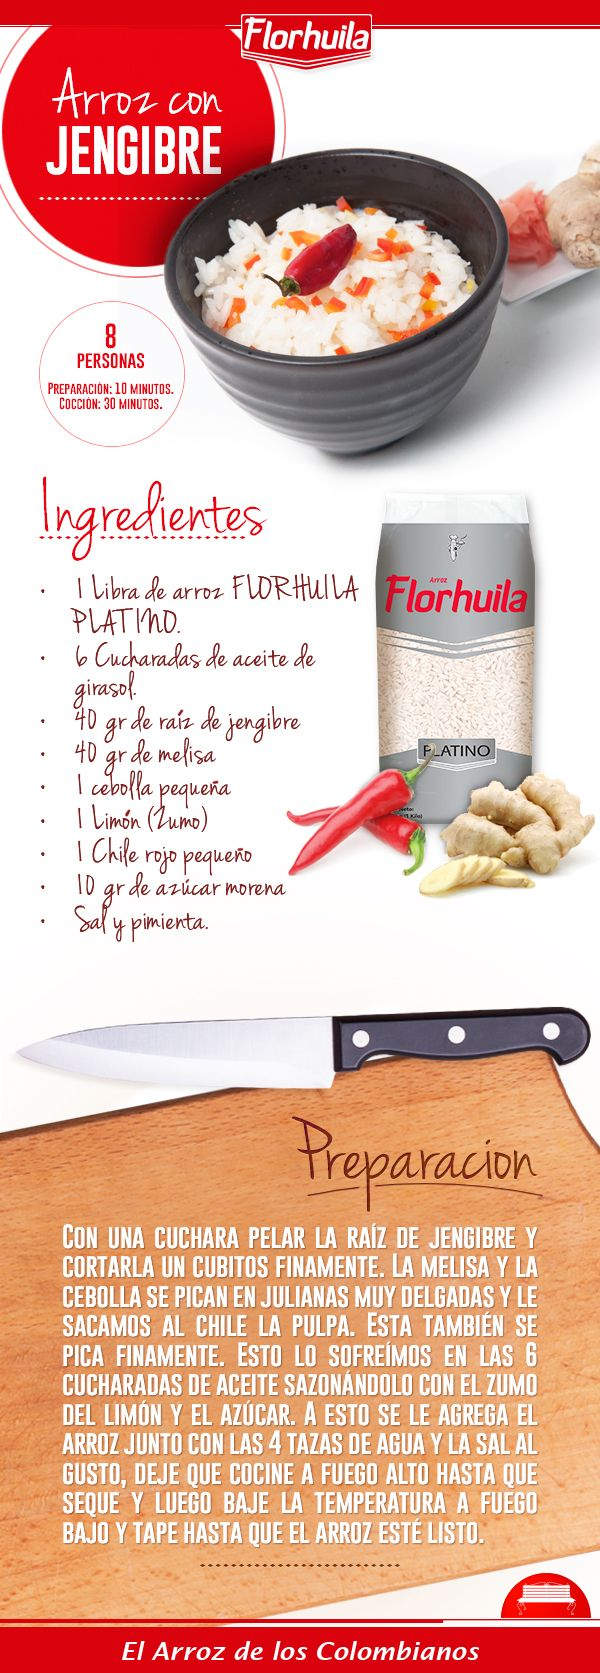 Disfruta de una deliciosa receta santandereana en familia: http://bit.ly/1E77aJu